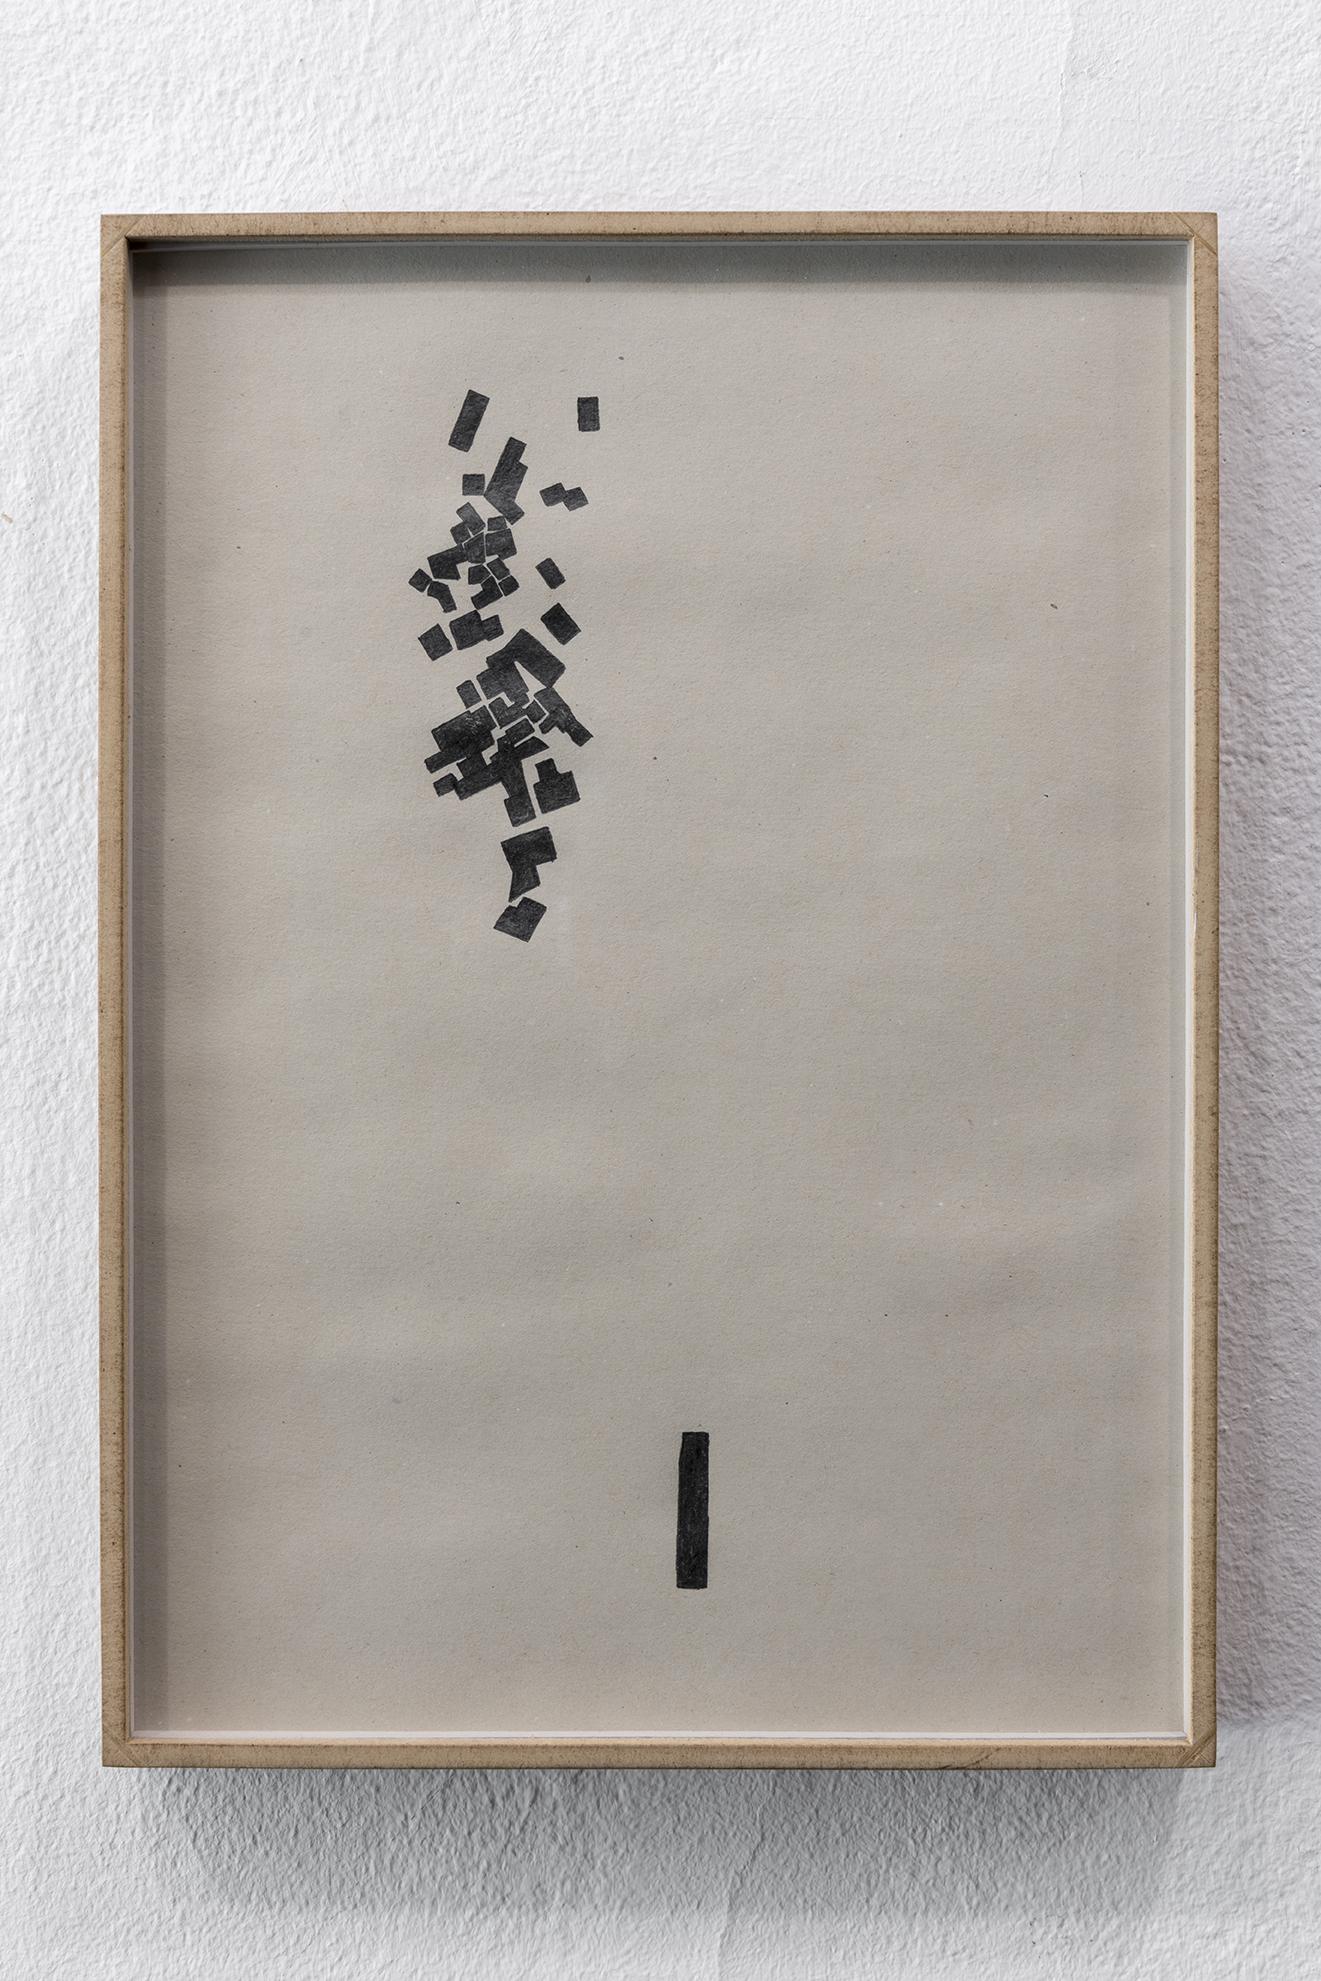 ORIOL ARIBAU. Untitled (CV), 2017 | Accrochage #4: Dauder, Jotta, Mendizabal & Oriol Aribau | ProjecteSD